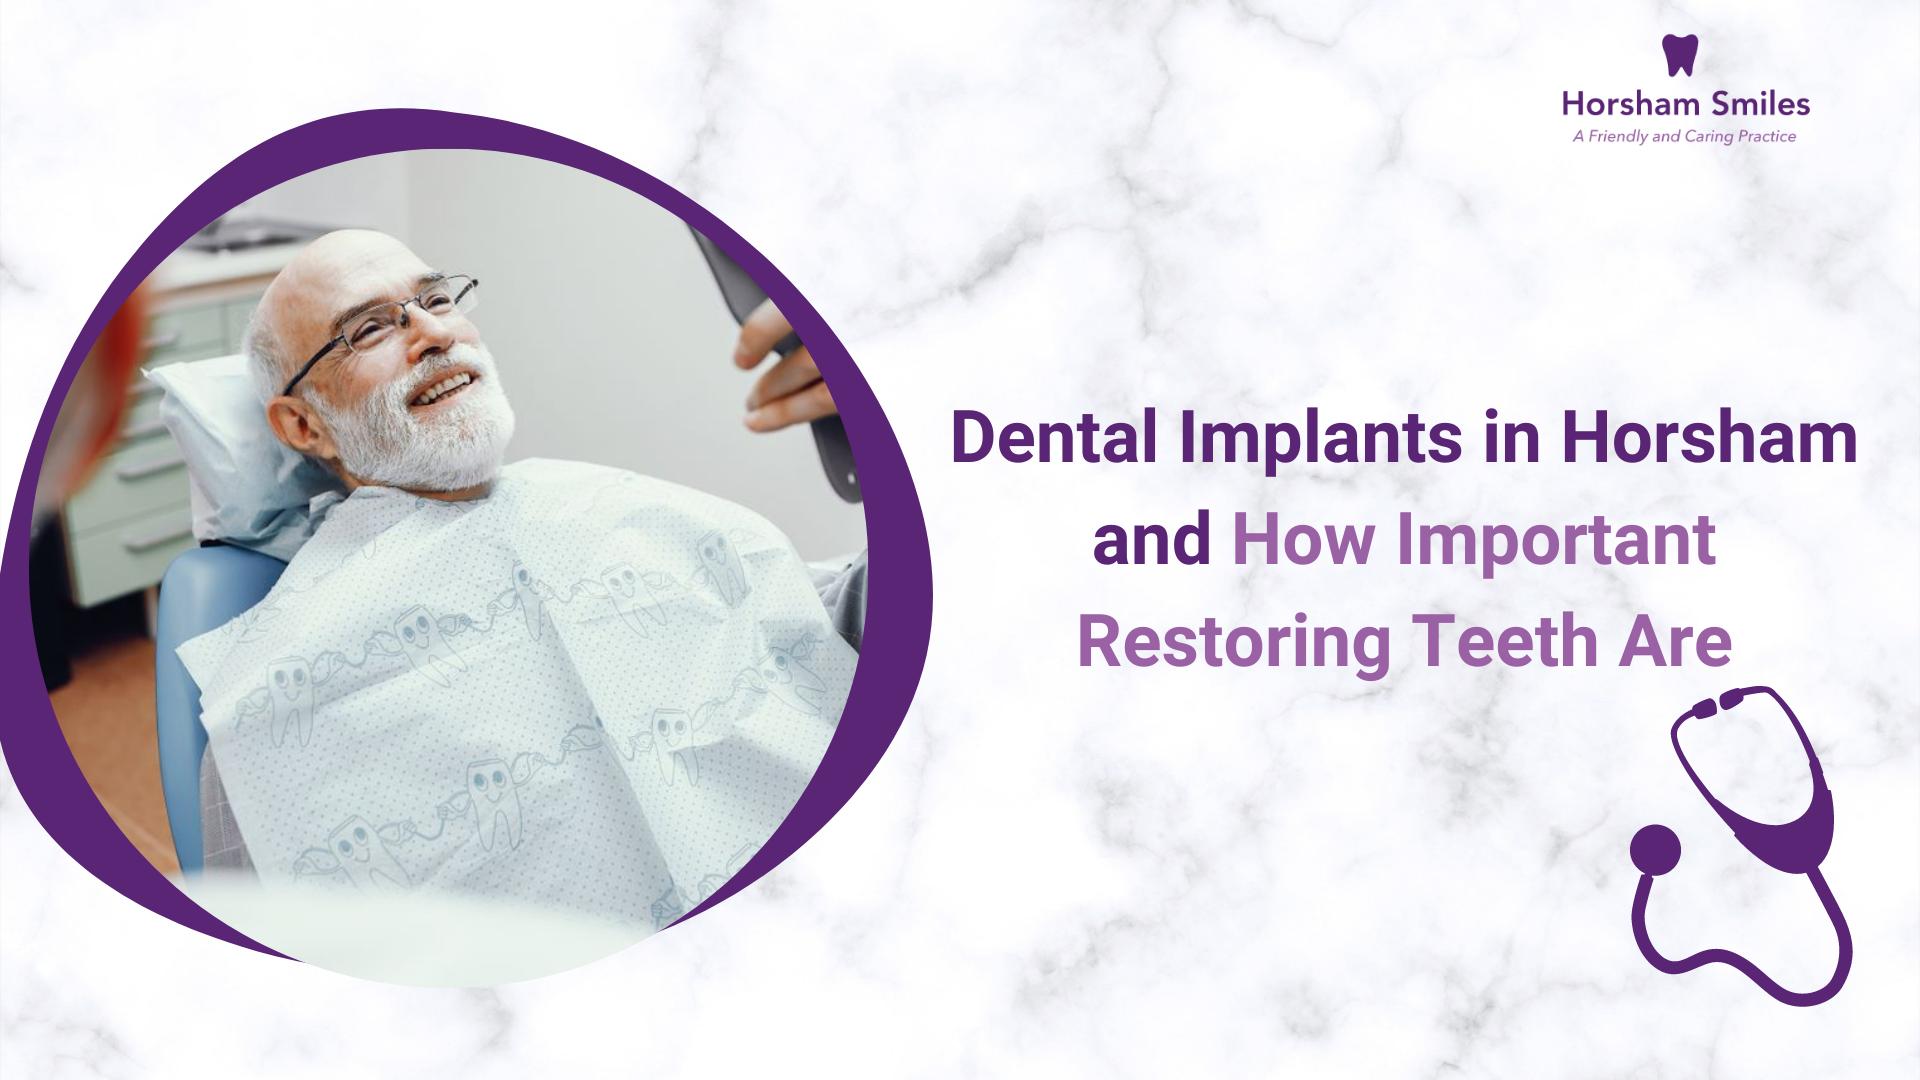 Dental Implants in Horsham